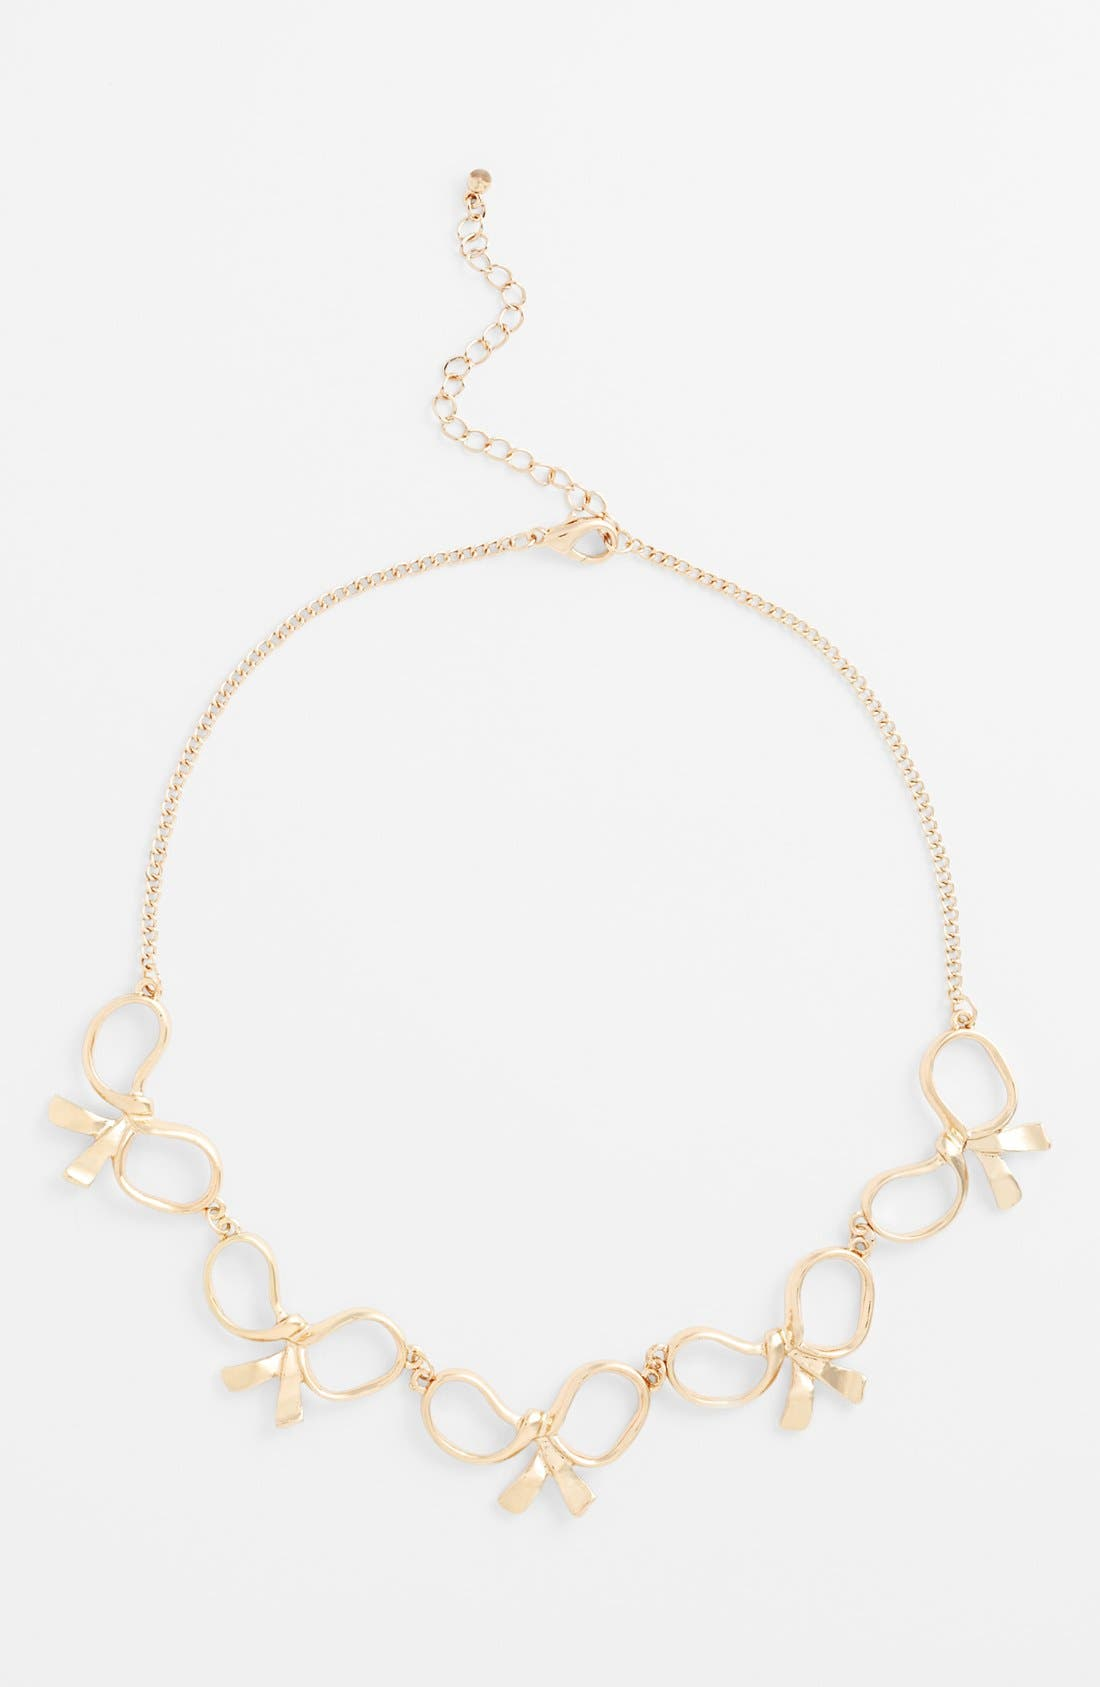 Main Image - Orion Cutout Bows Necklace